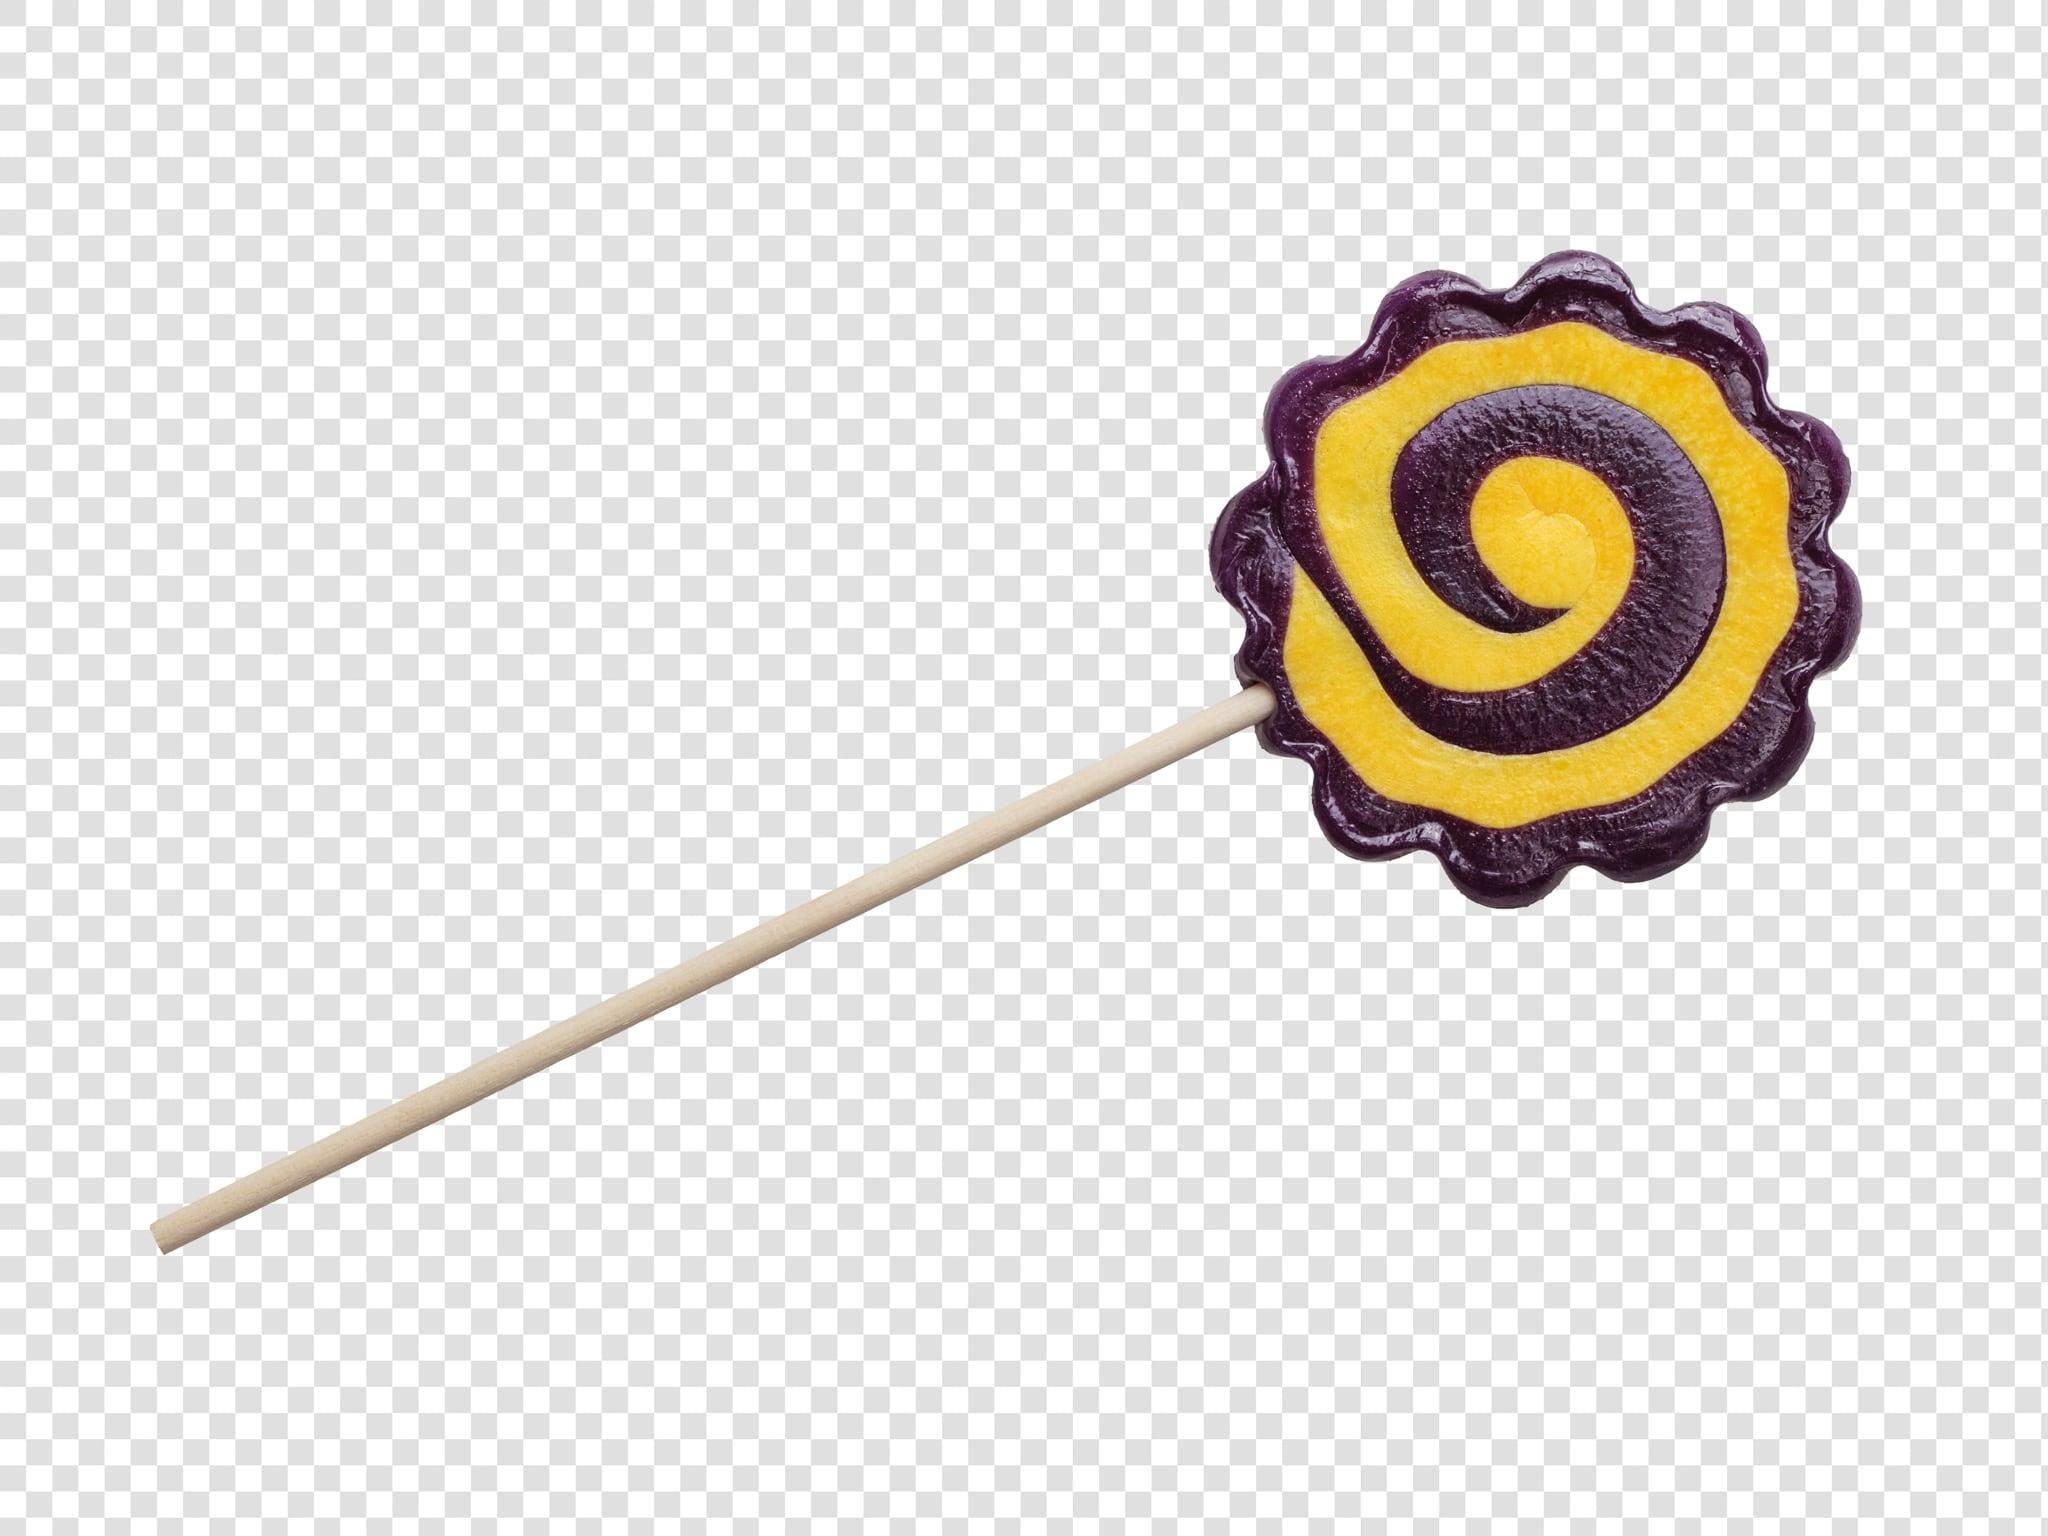 Lollipop PSD layered image